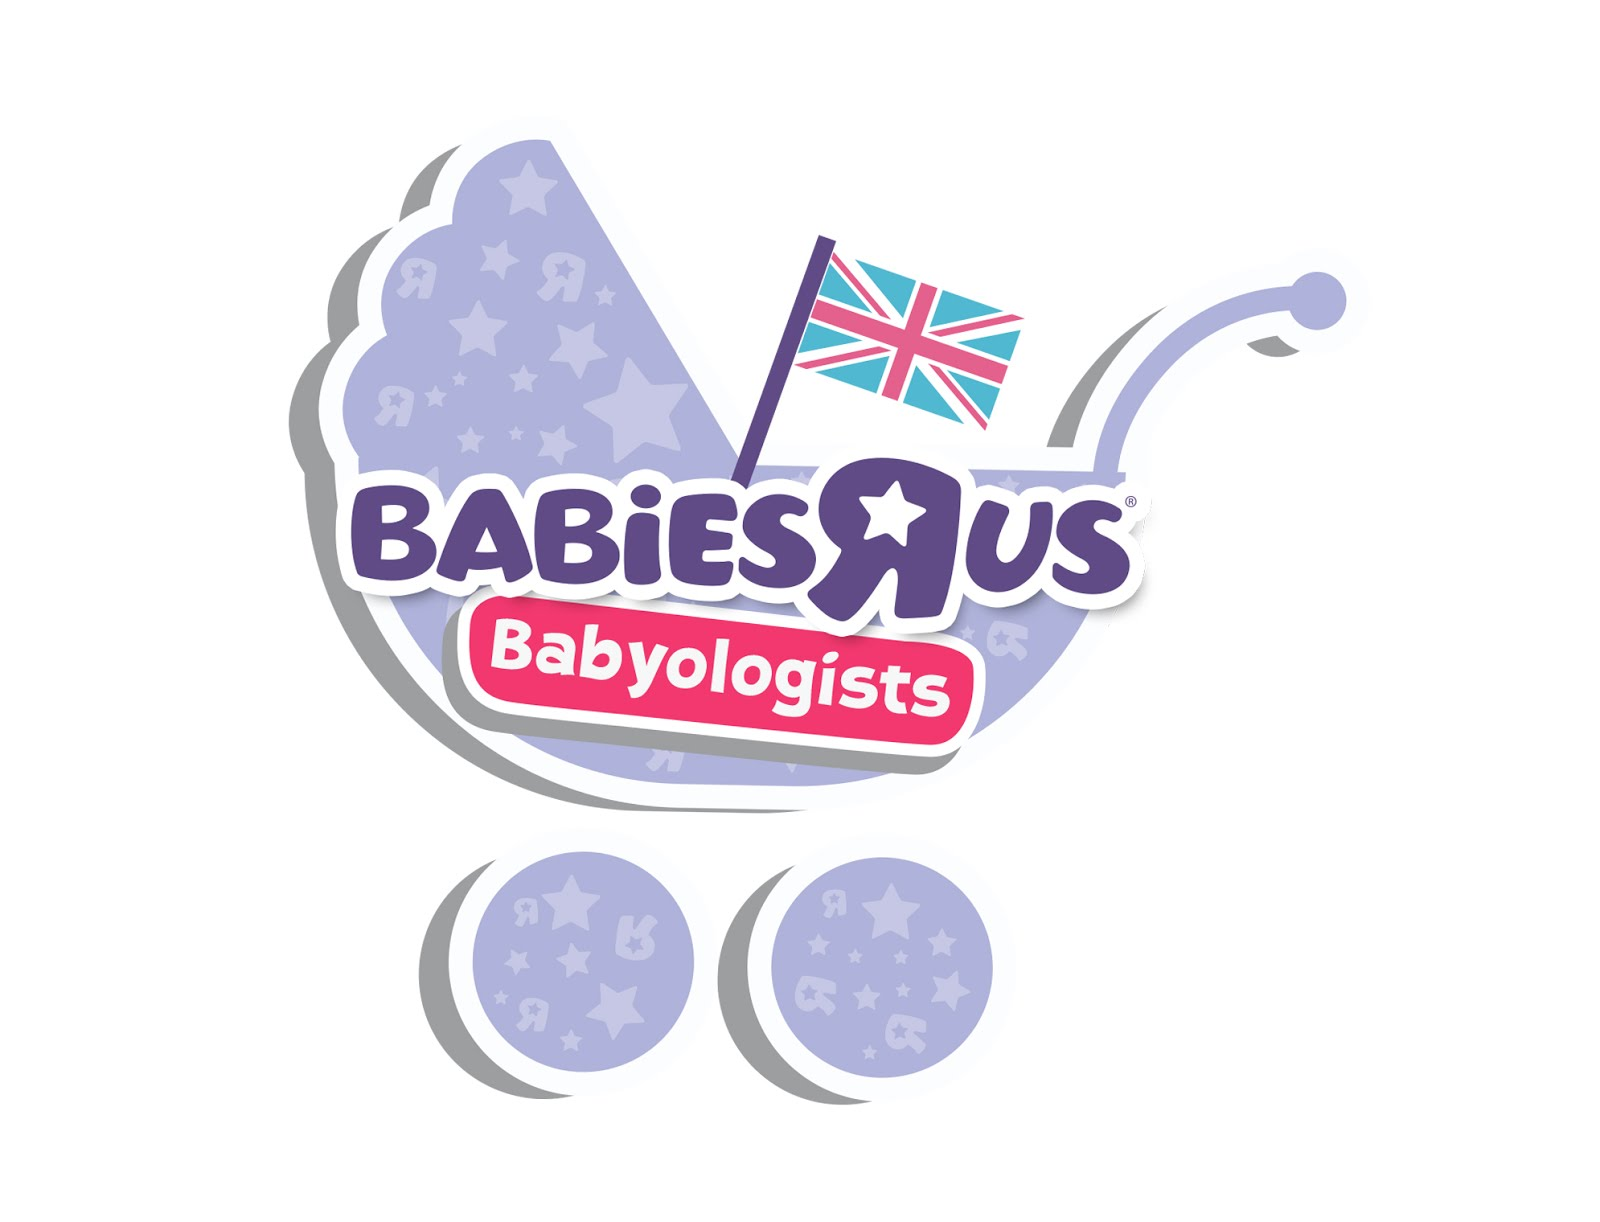 Alexander is a Babyologist!